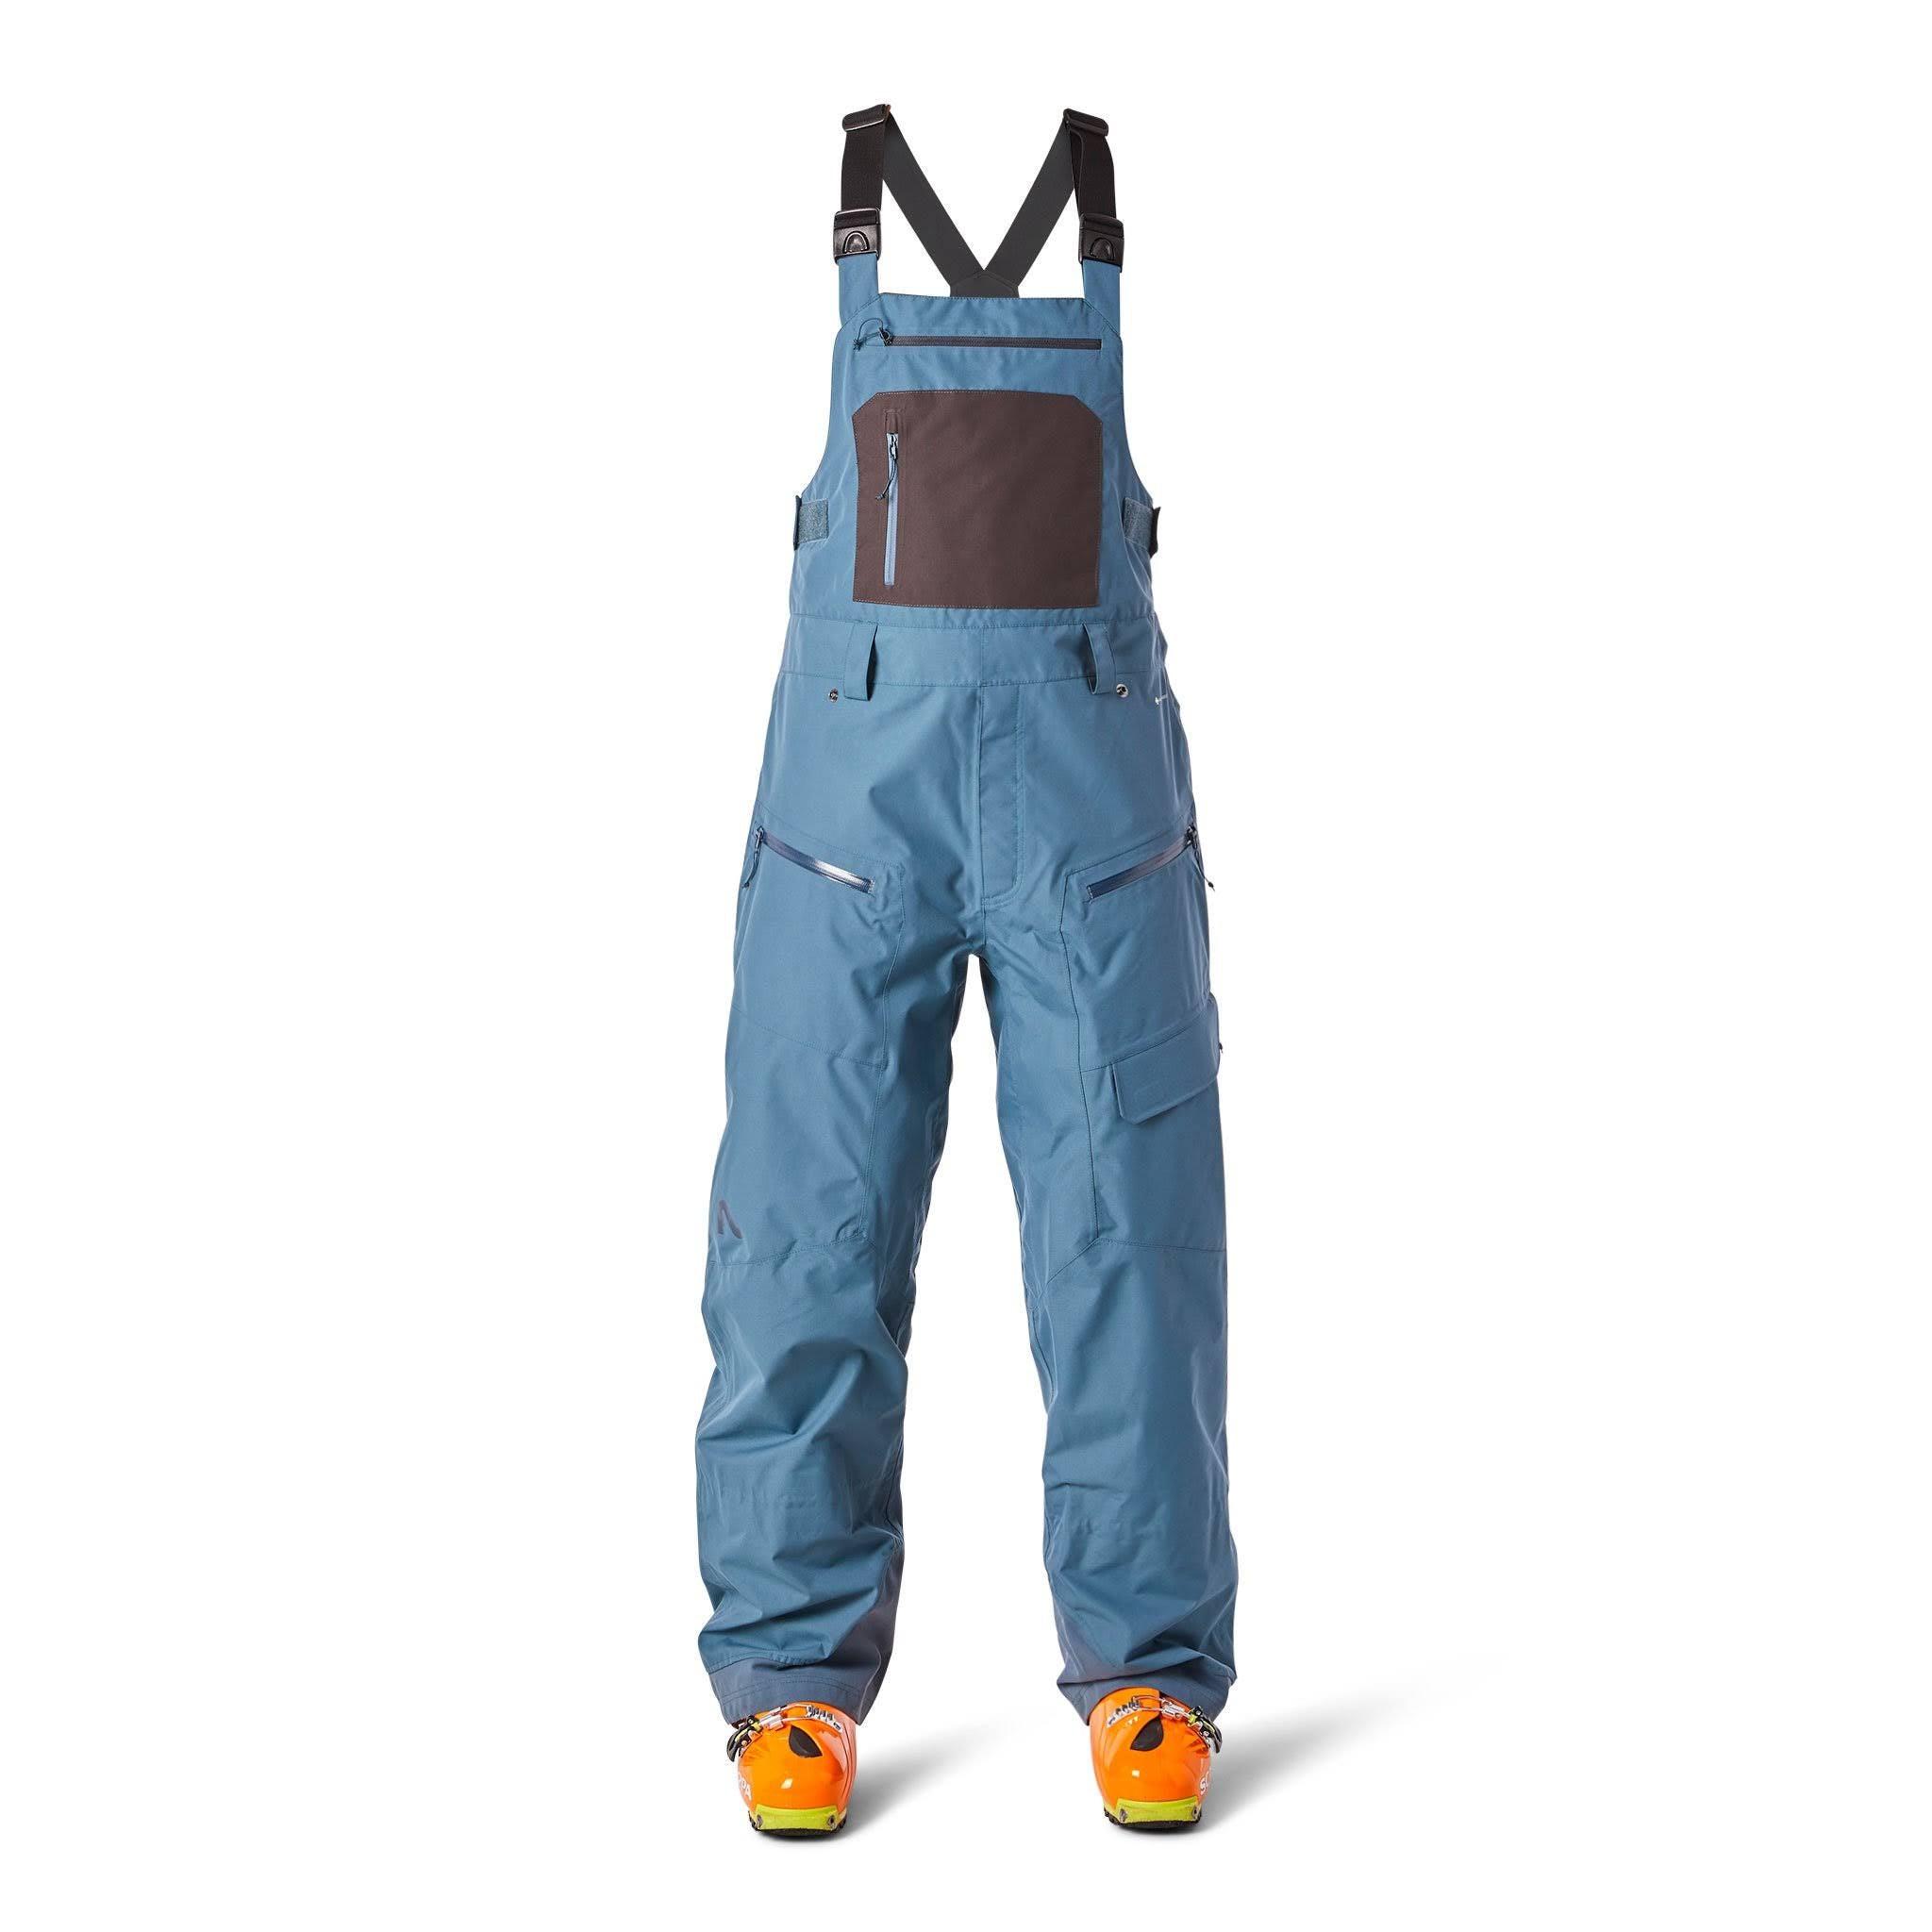 Flylow Firebird Bib Men's Storm / M Pants